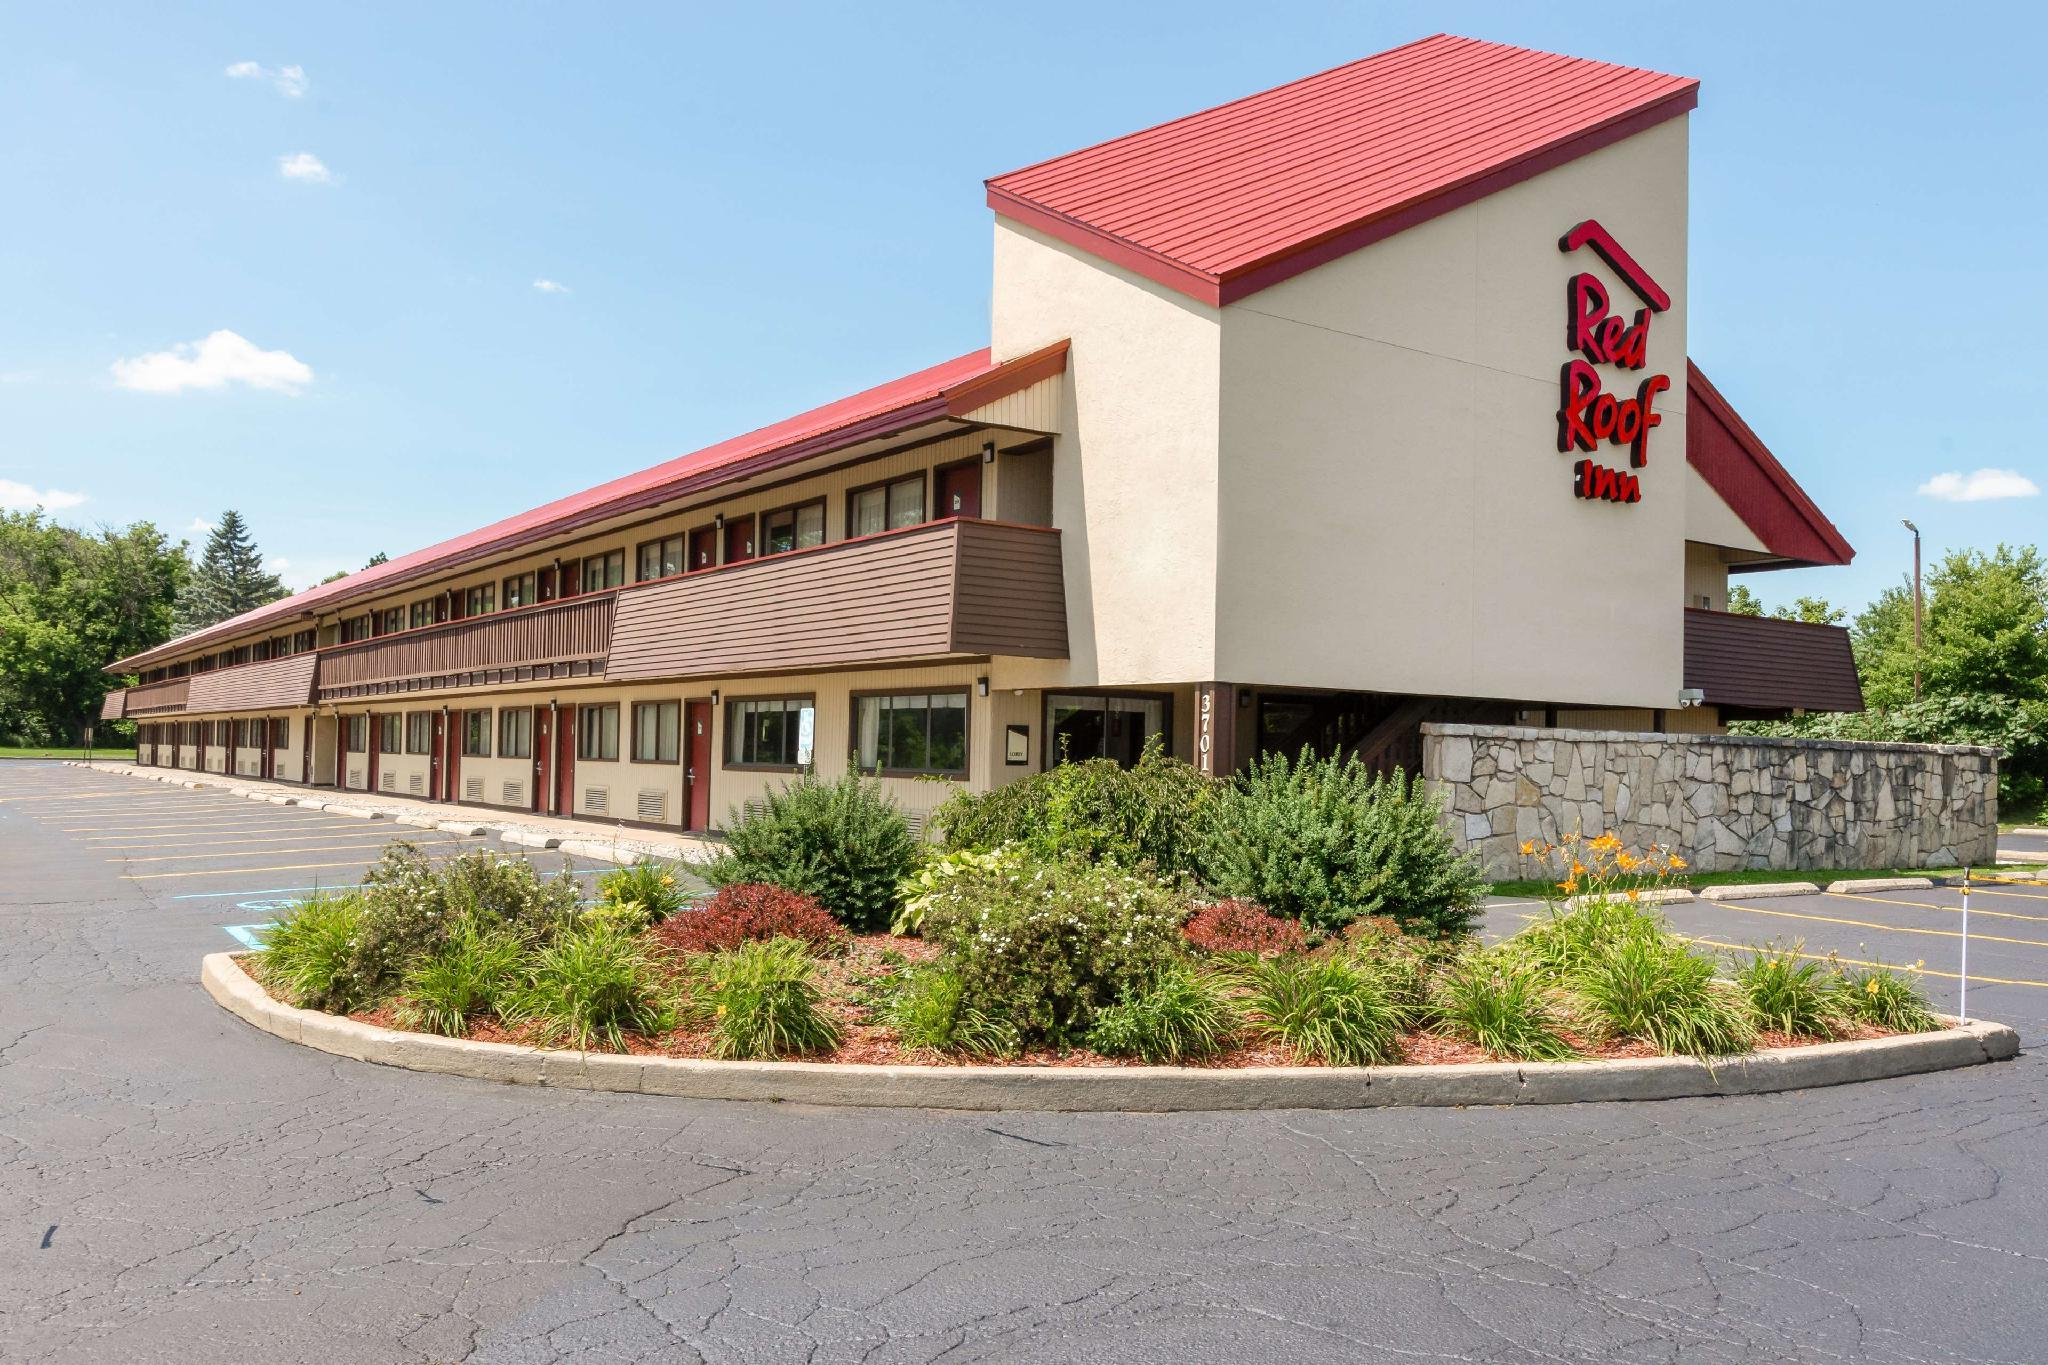 Red Roof Inn Kalamazoo East   Expo Center